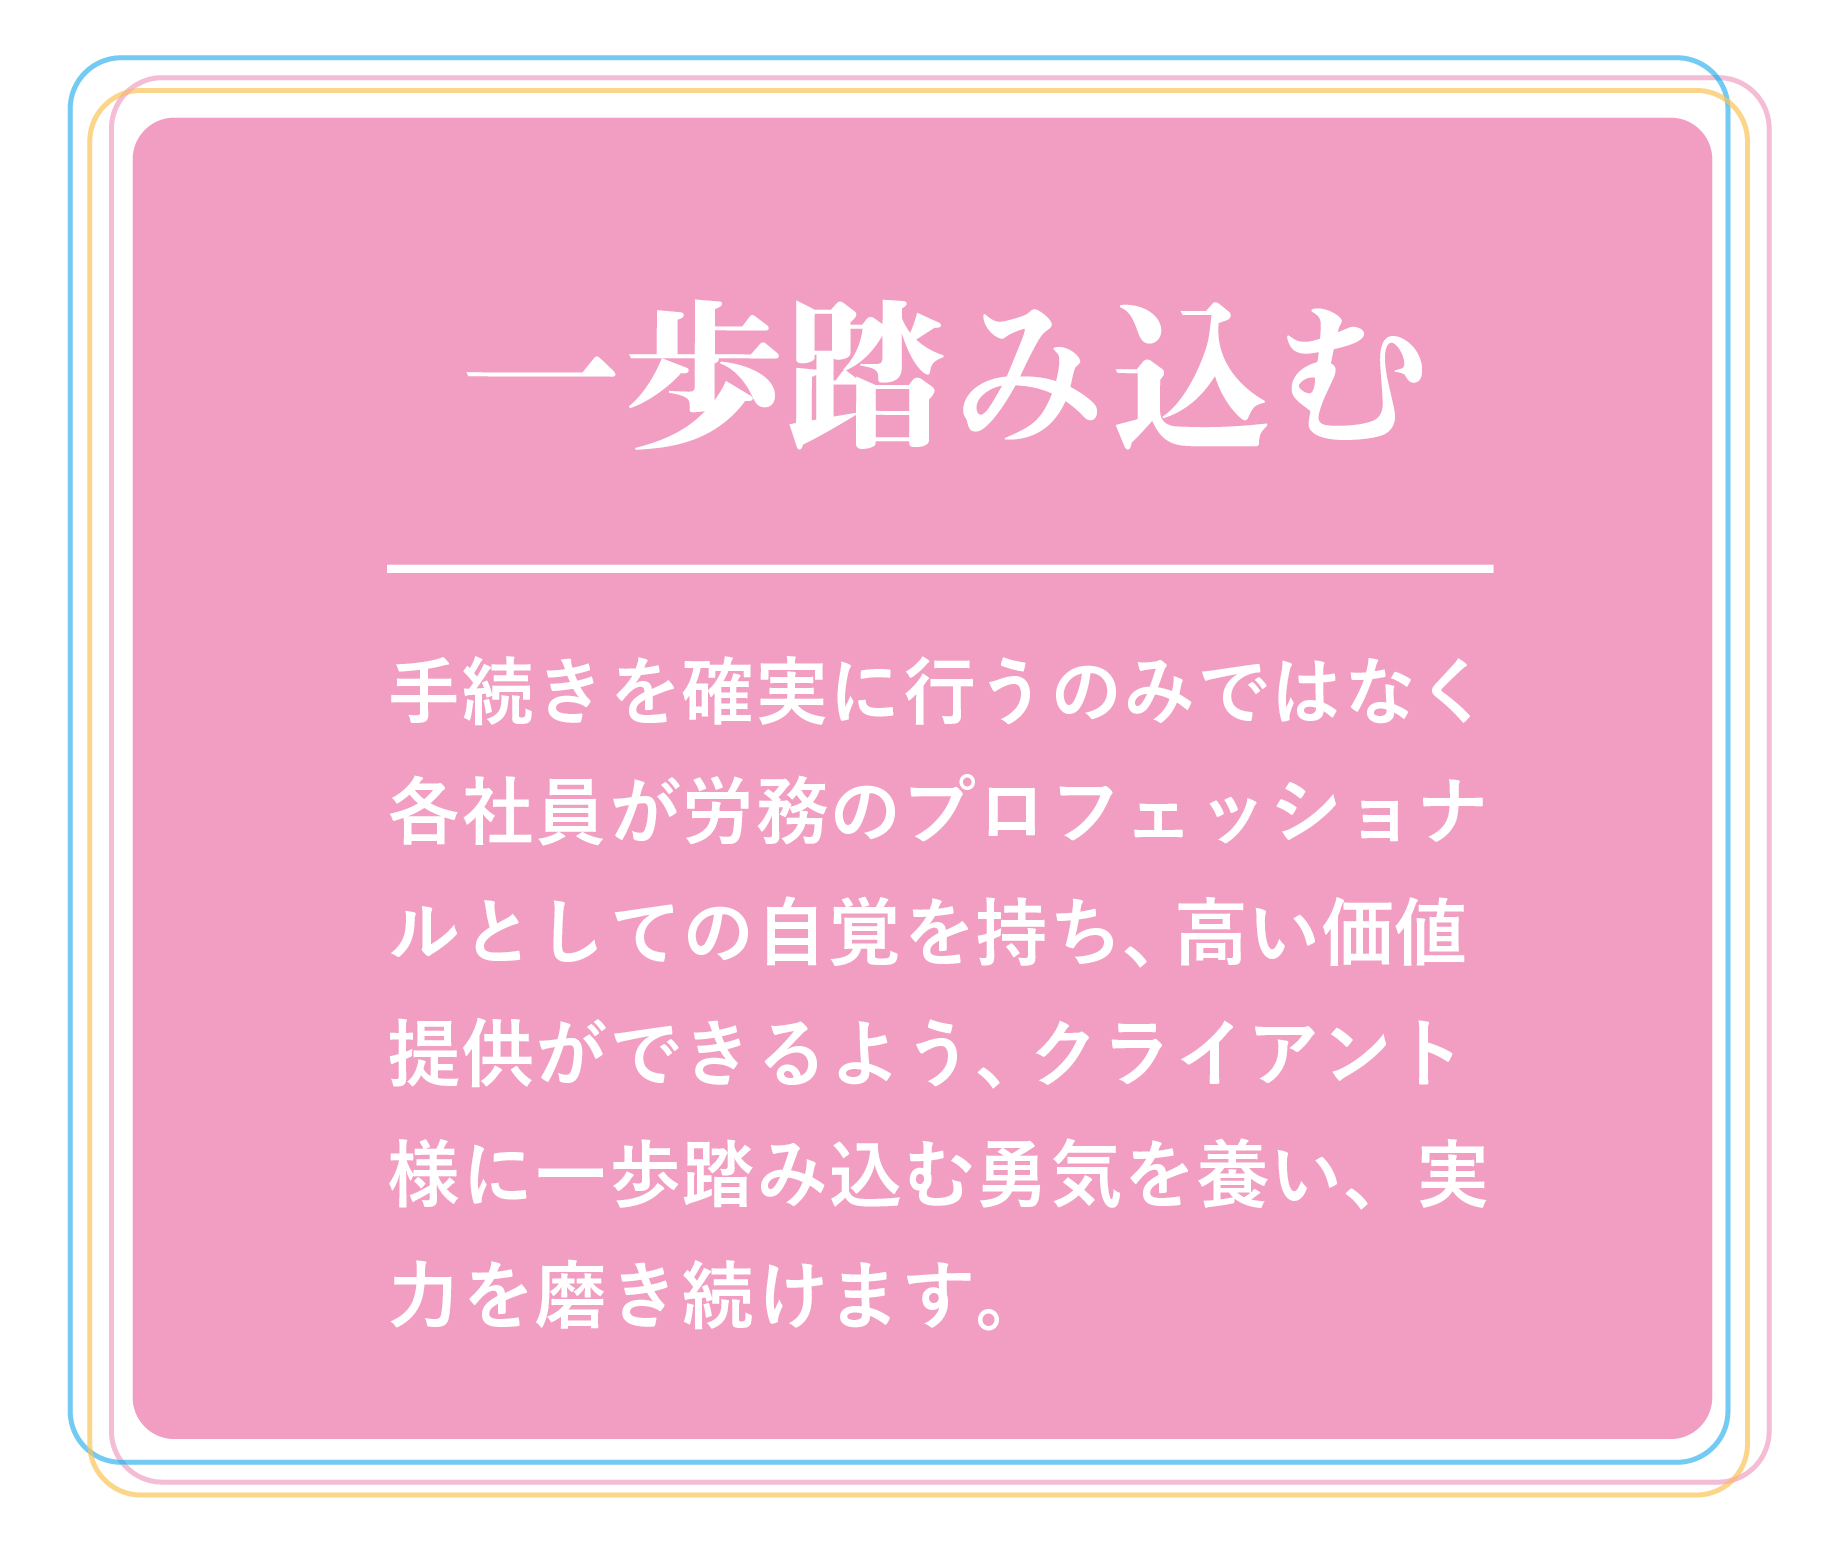 slogan3